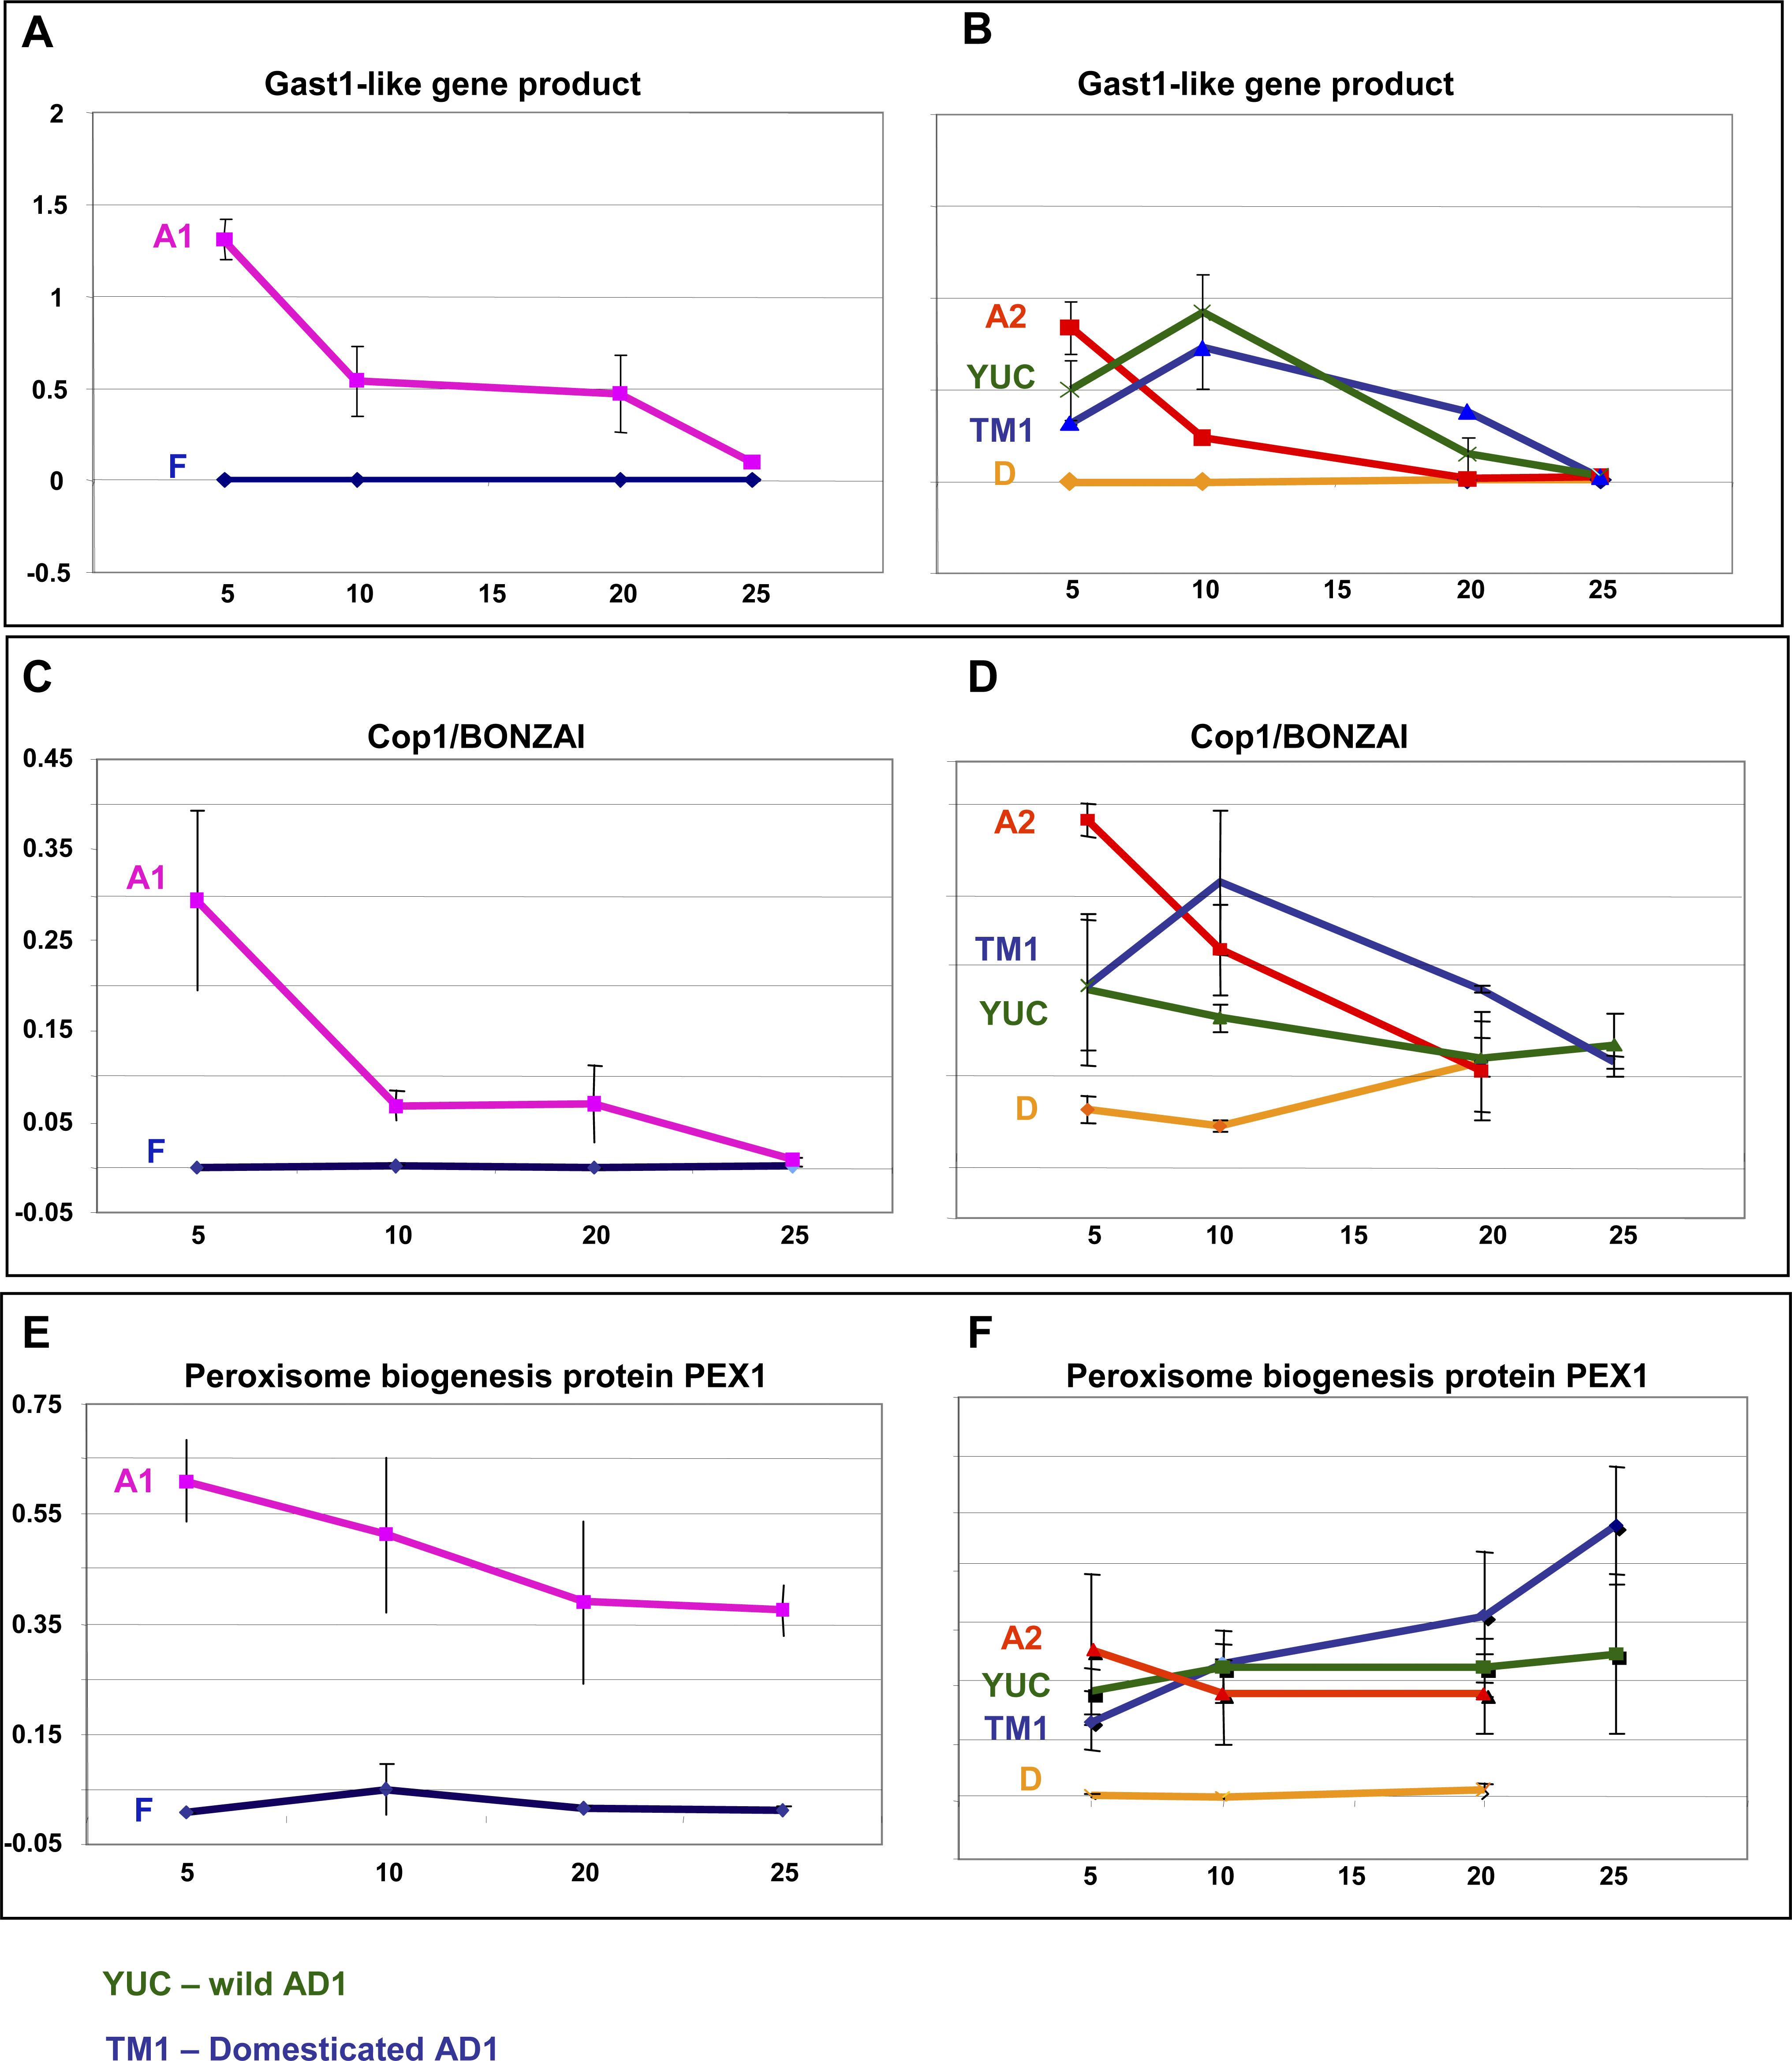 Quantitative Real-Time PCR Analyses of Three Candidate Genes Controlling H<sub>2</sub>O<sub>2</sub> Levels